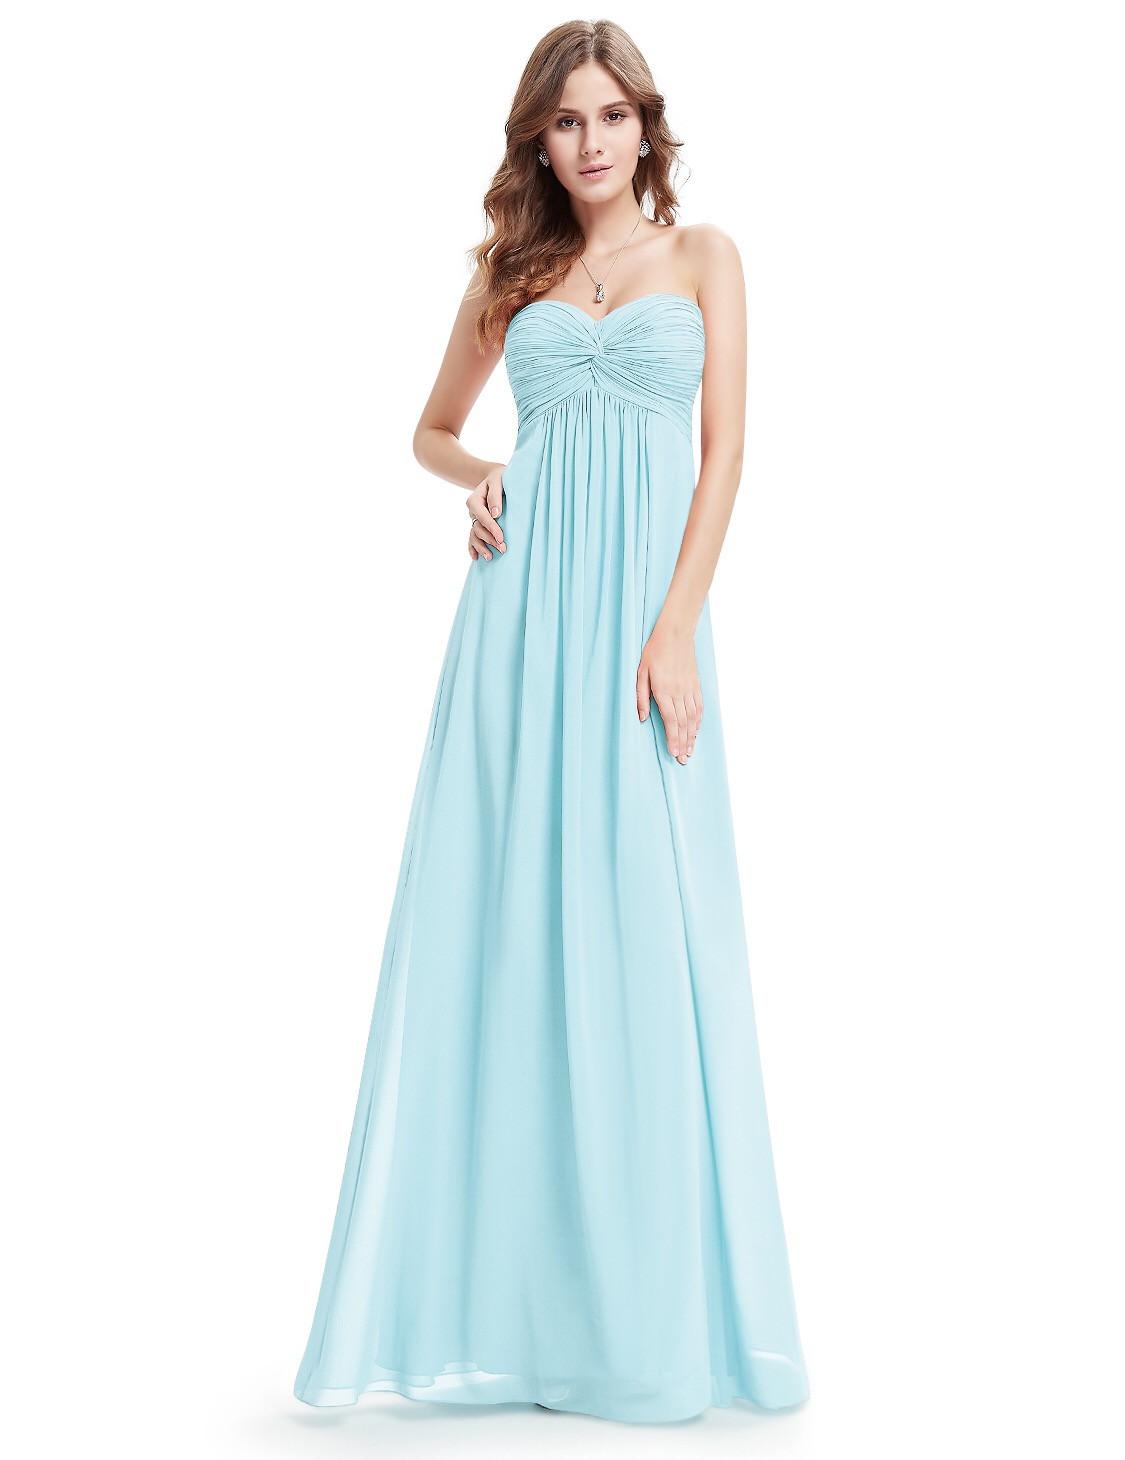 Sweetheart Strapless Light Blue Bridesmaid Dress